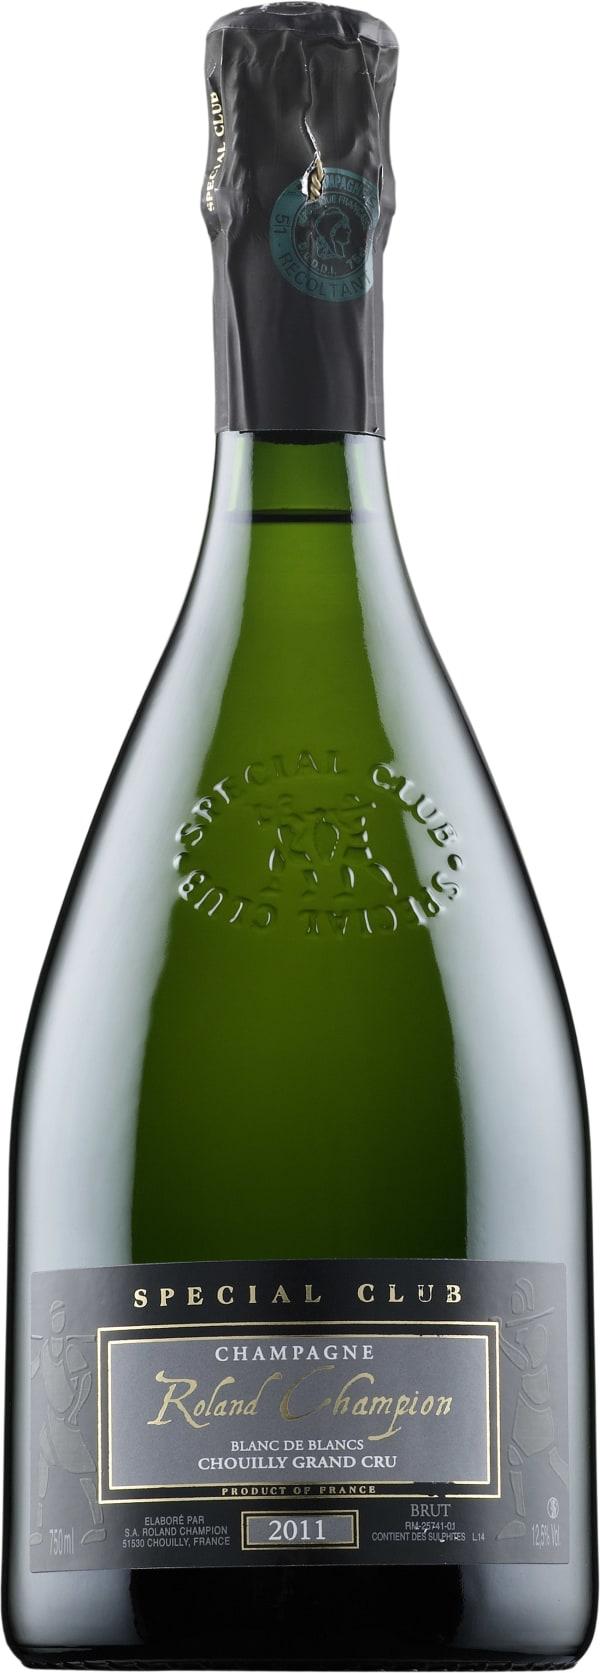 Roland Champion Special Club Blanc de Blancs Grand Cru Chouilly Champagne Brut 2011